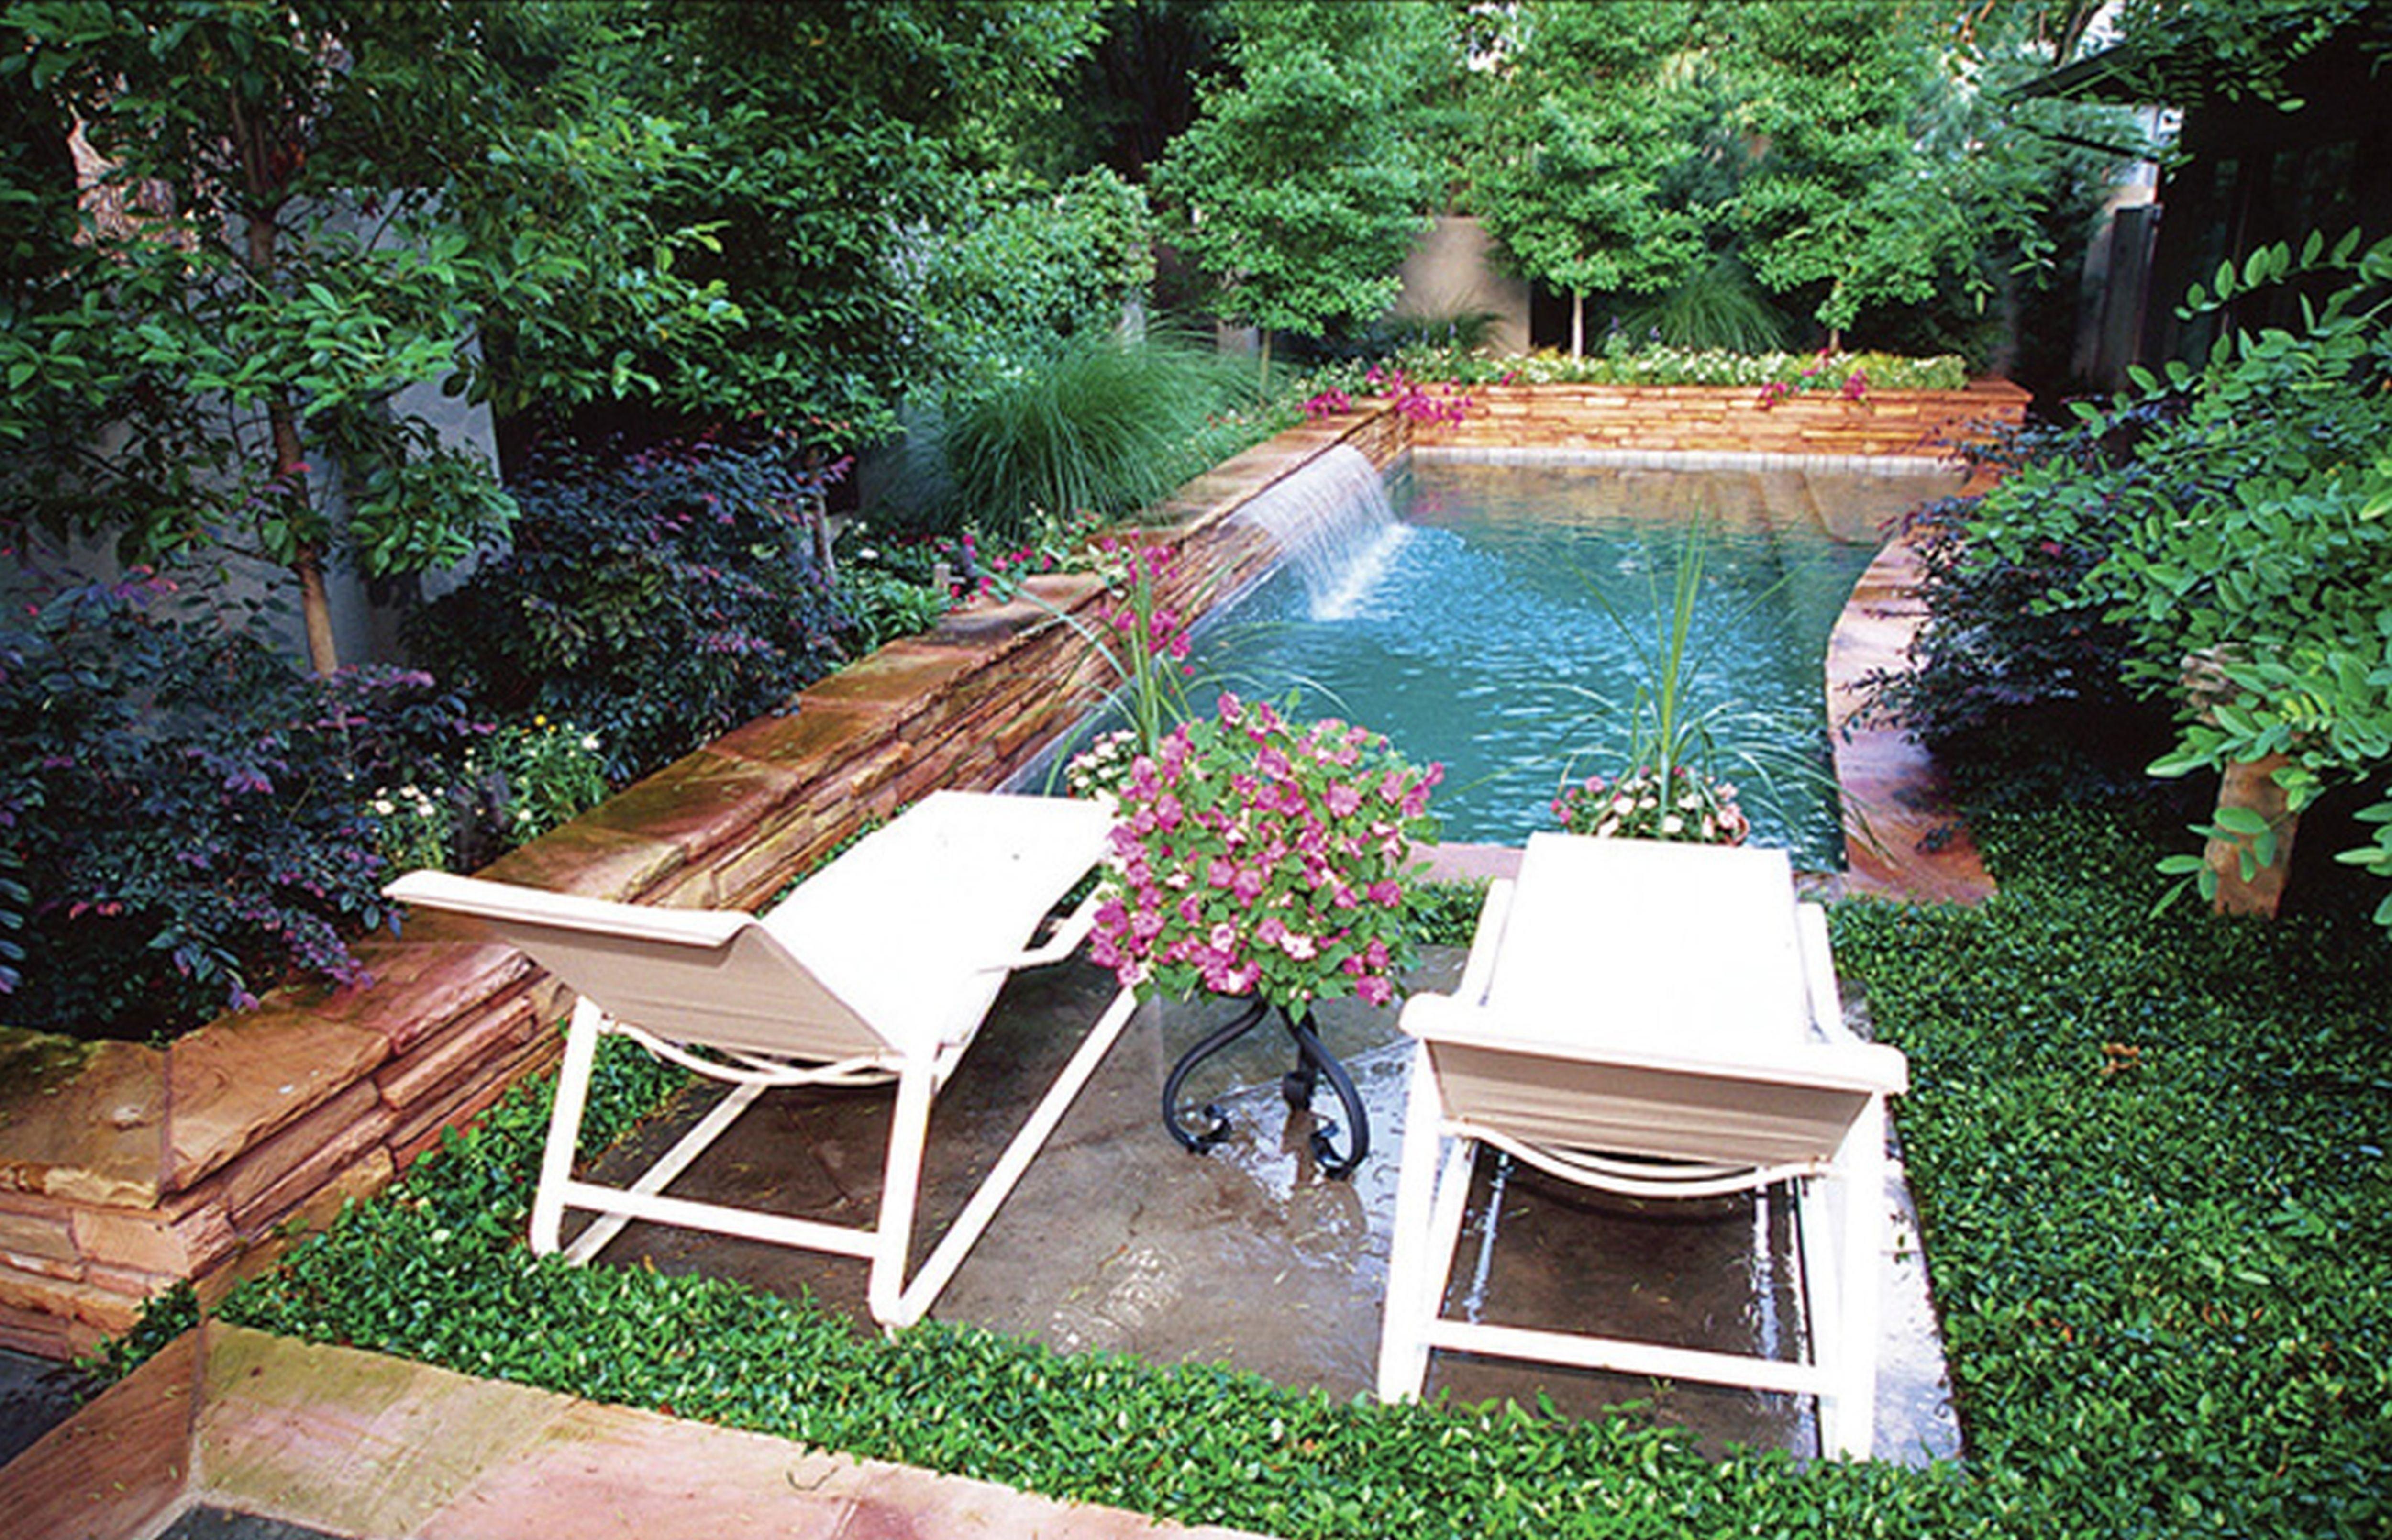 10 Perfect Garden Ideas On A Budget garden ideas on a budget best of backyard ideas for small yards a 2021